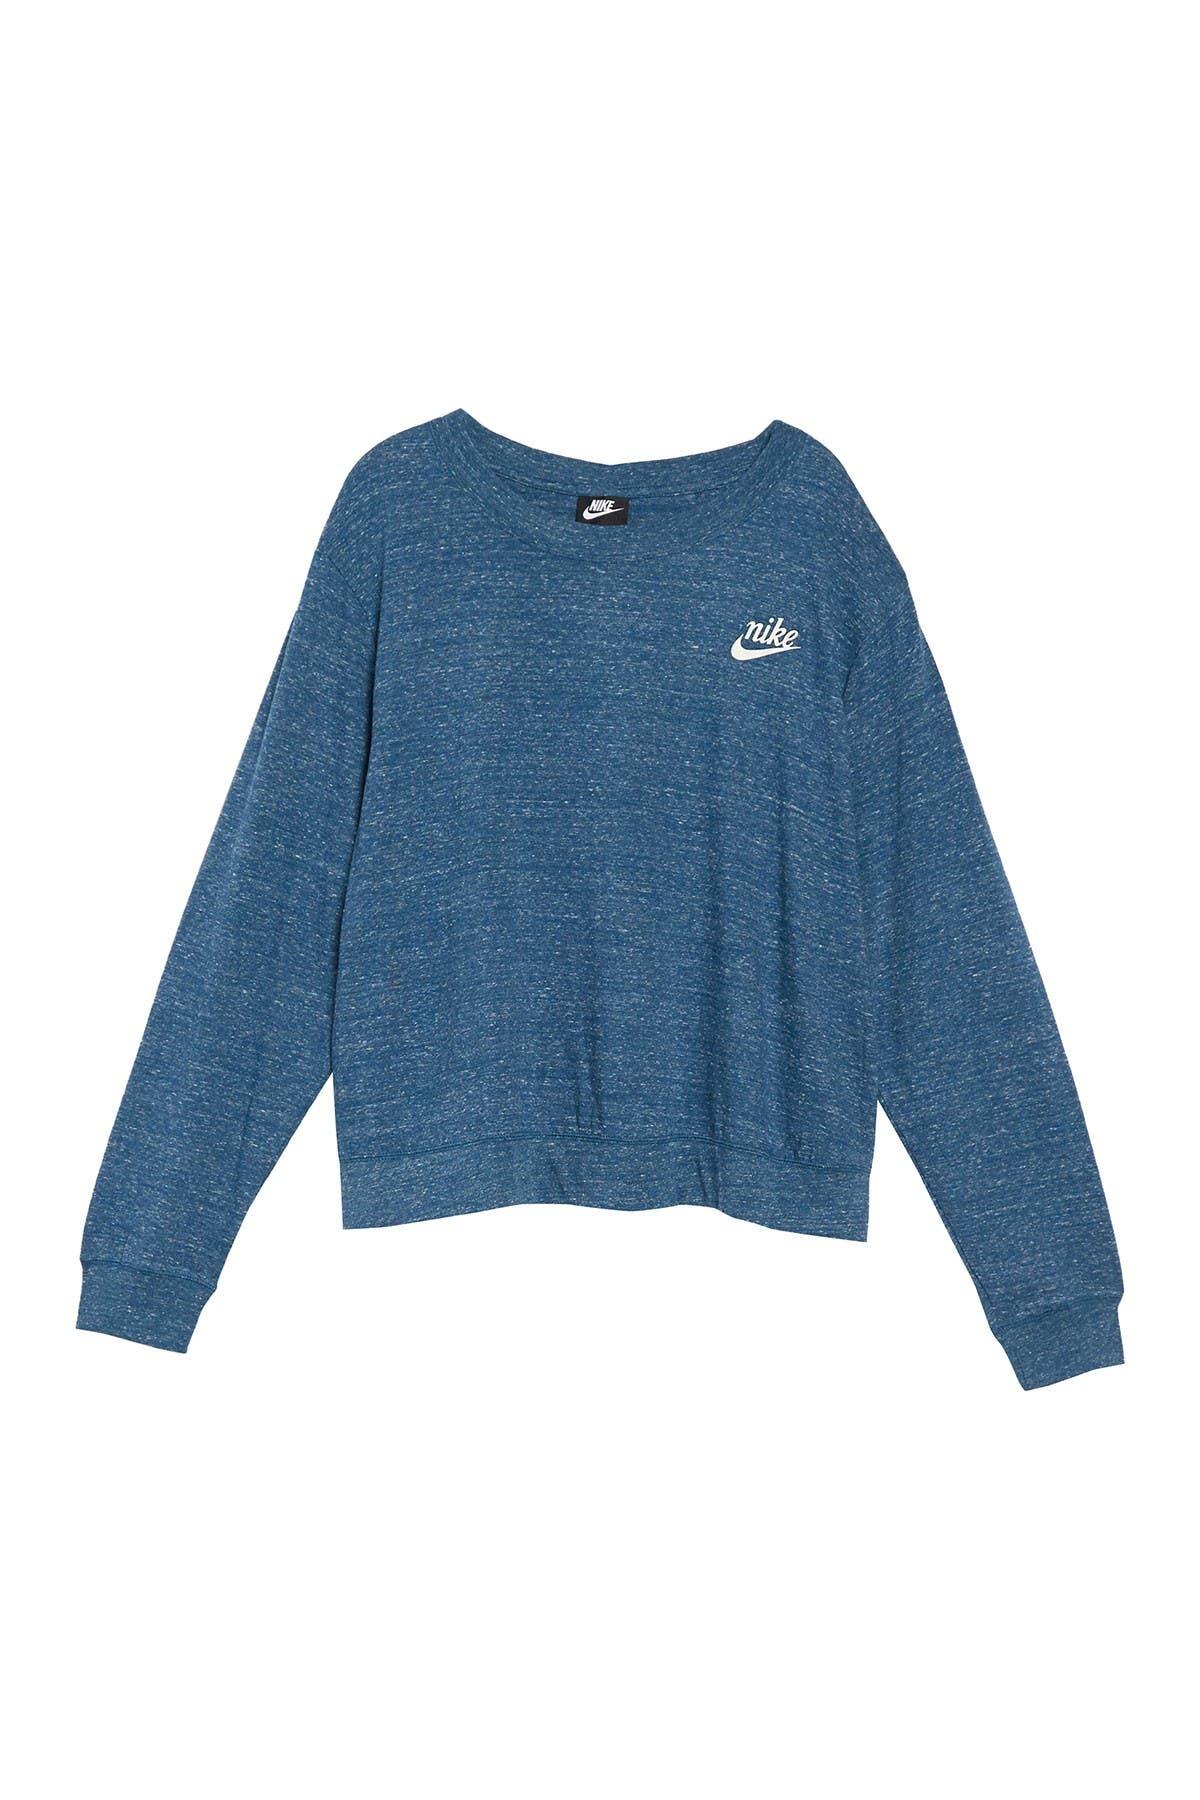 Nike | Gym Vintage Crew Neck Pullover